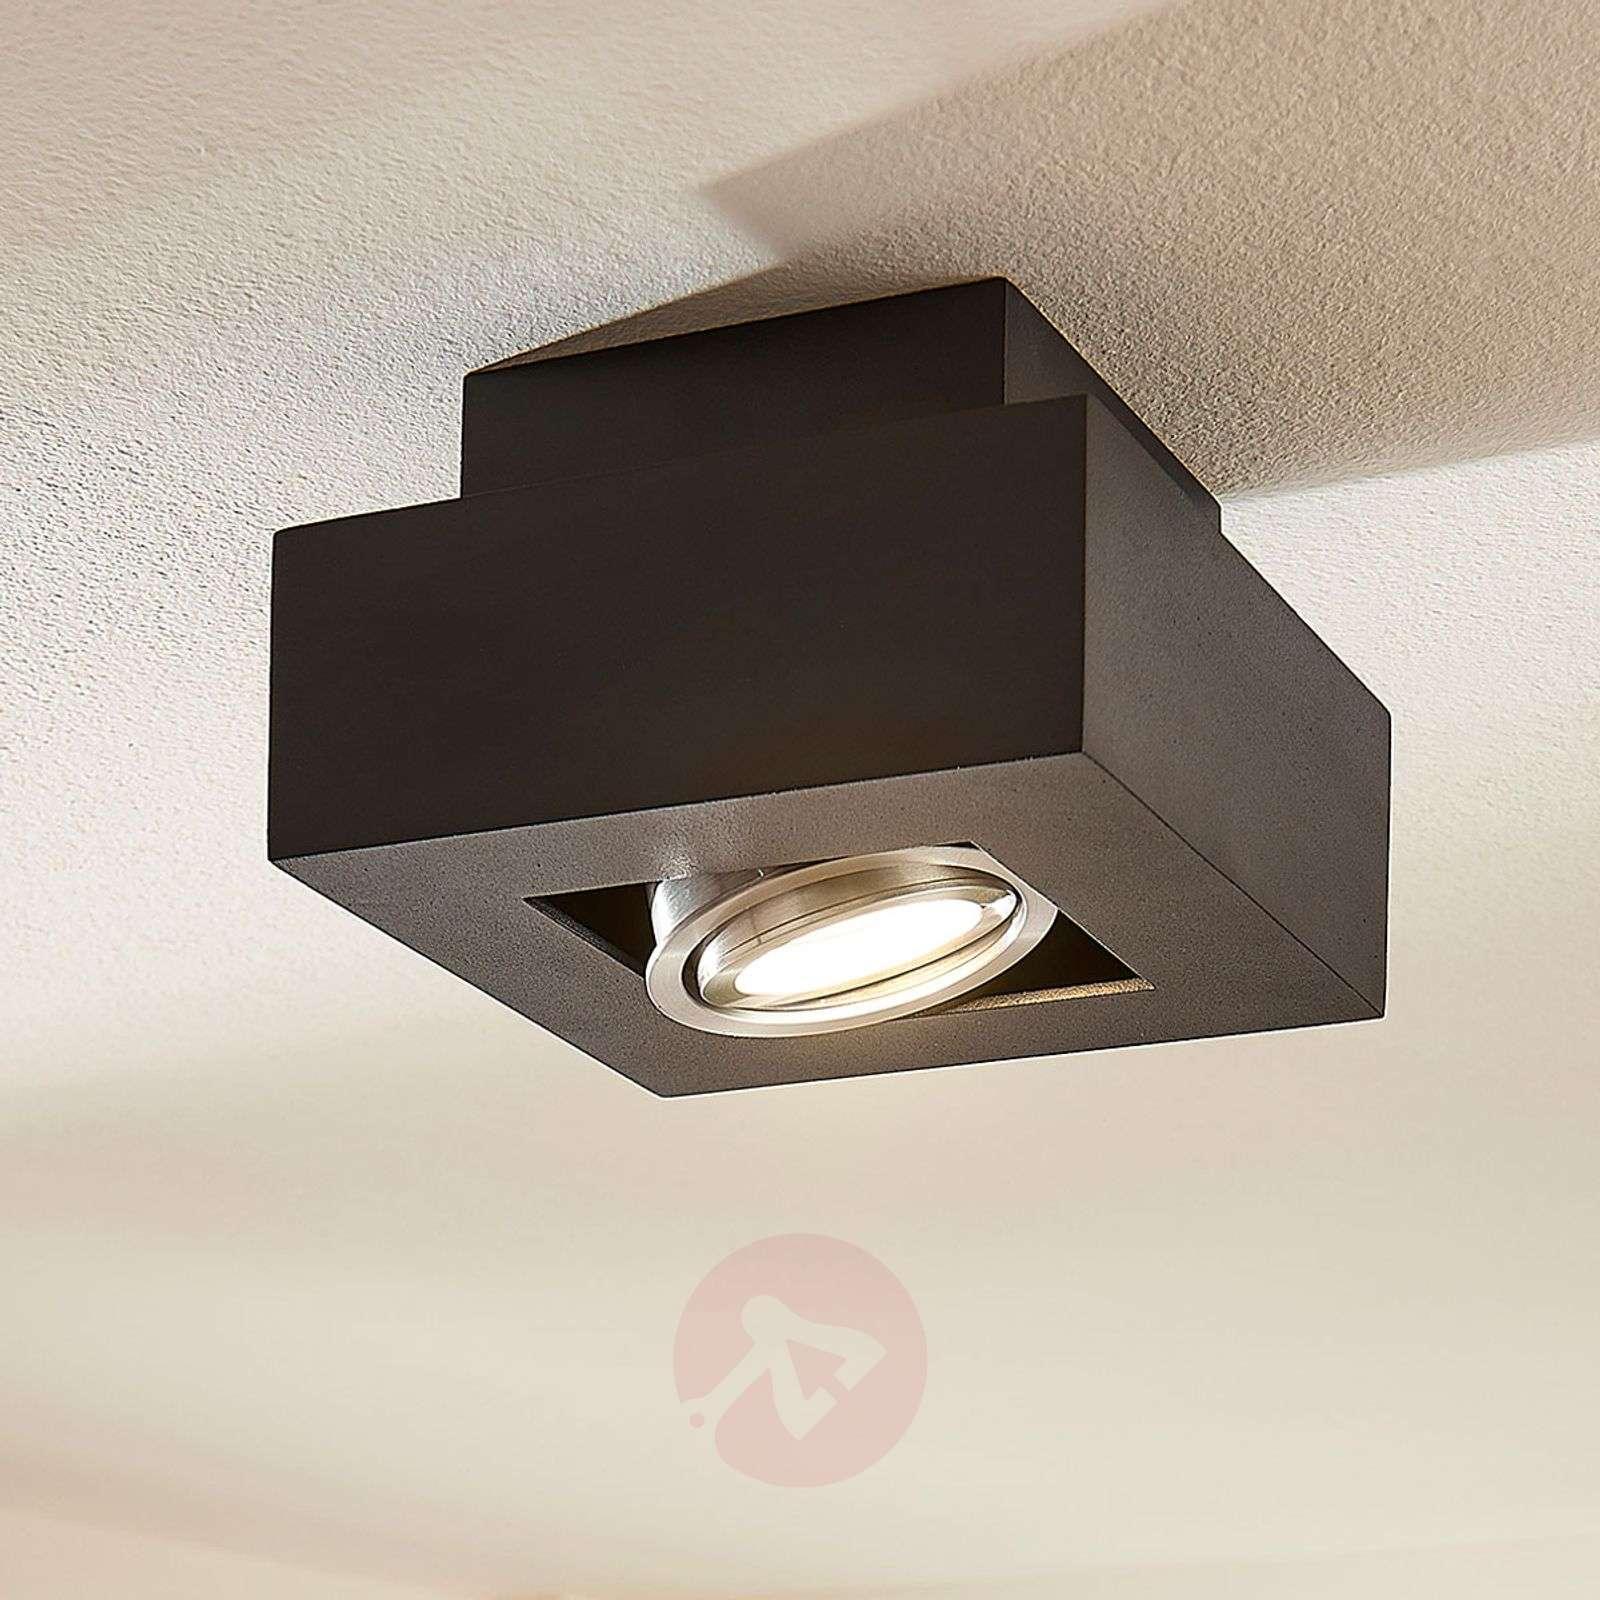 LED-kattolamppu Vince, 14 x 14 cm musta-9621706-01